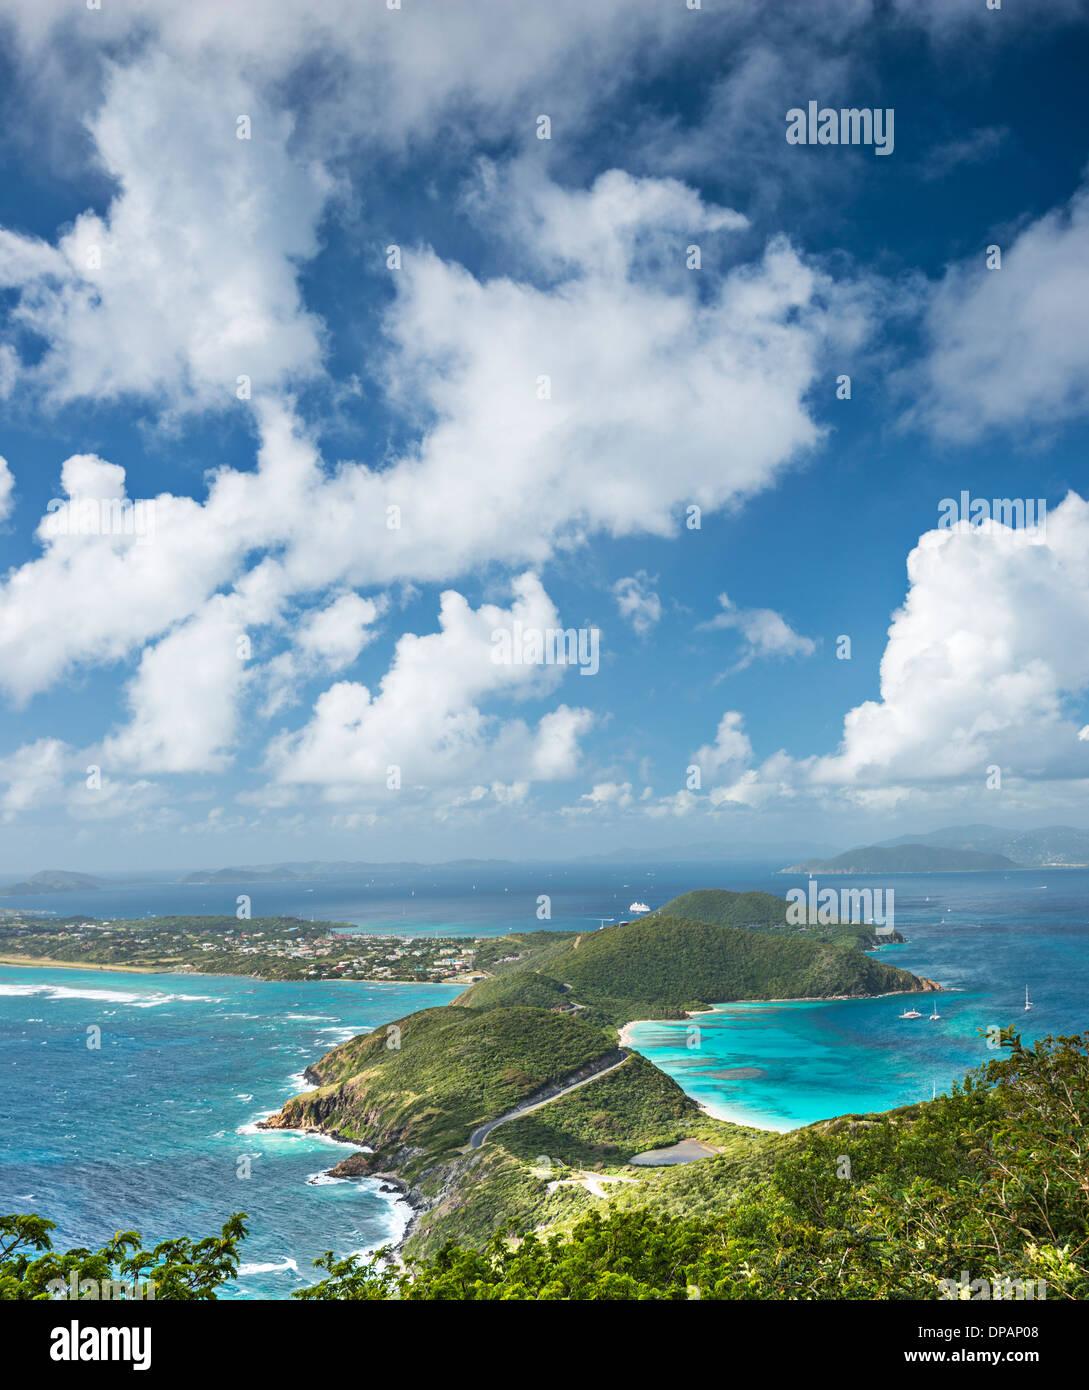 Virgin Gorda, Britische Jungferninseln in der Karibik. Stockbild